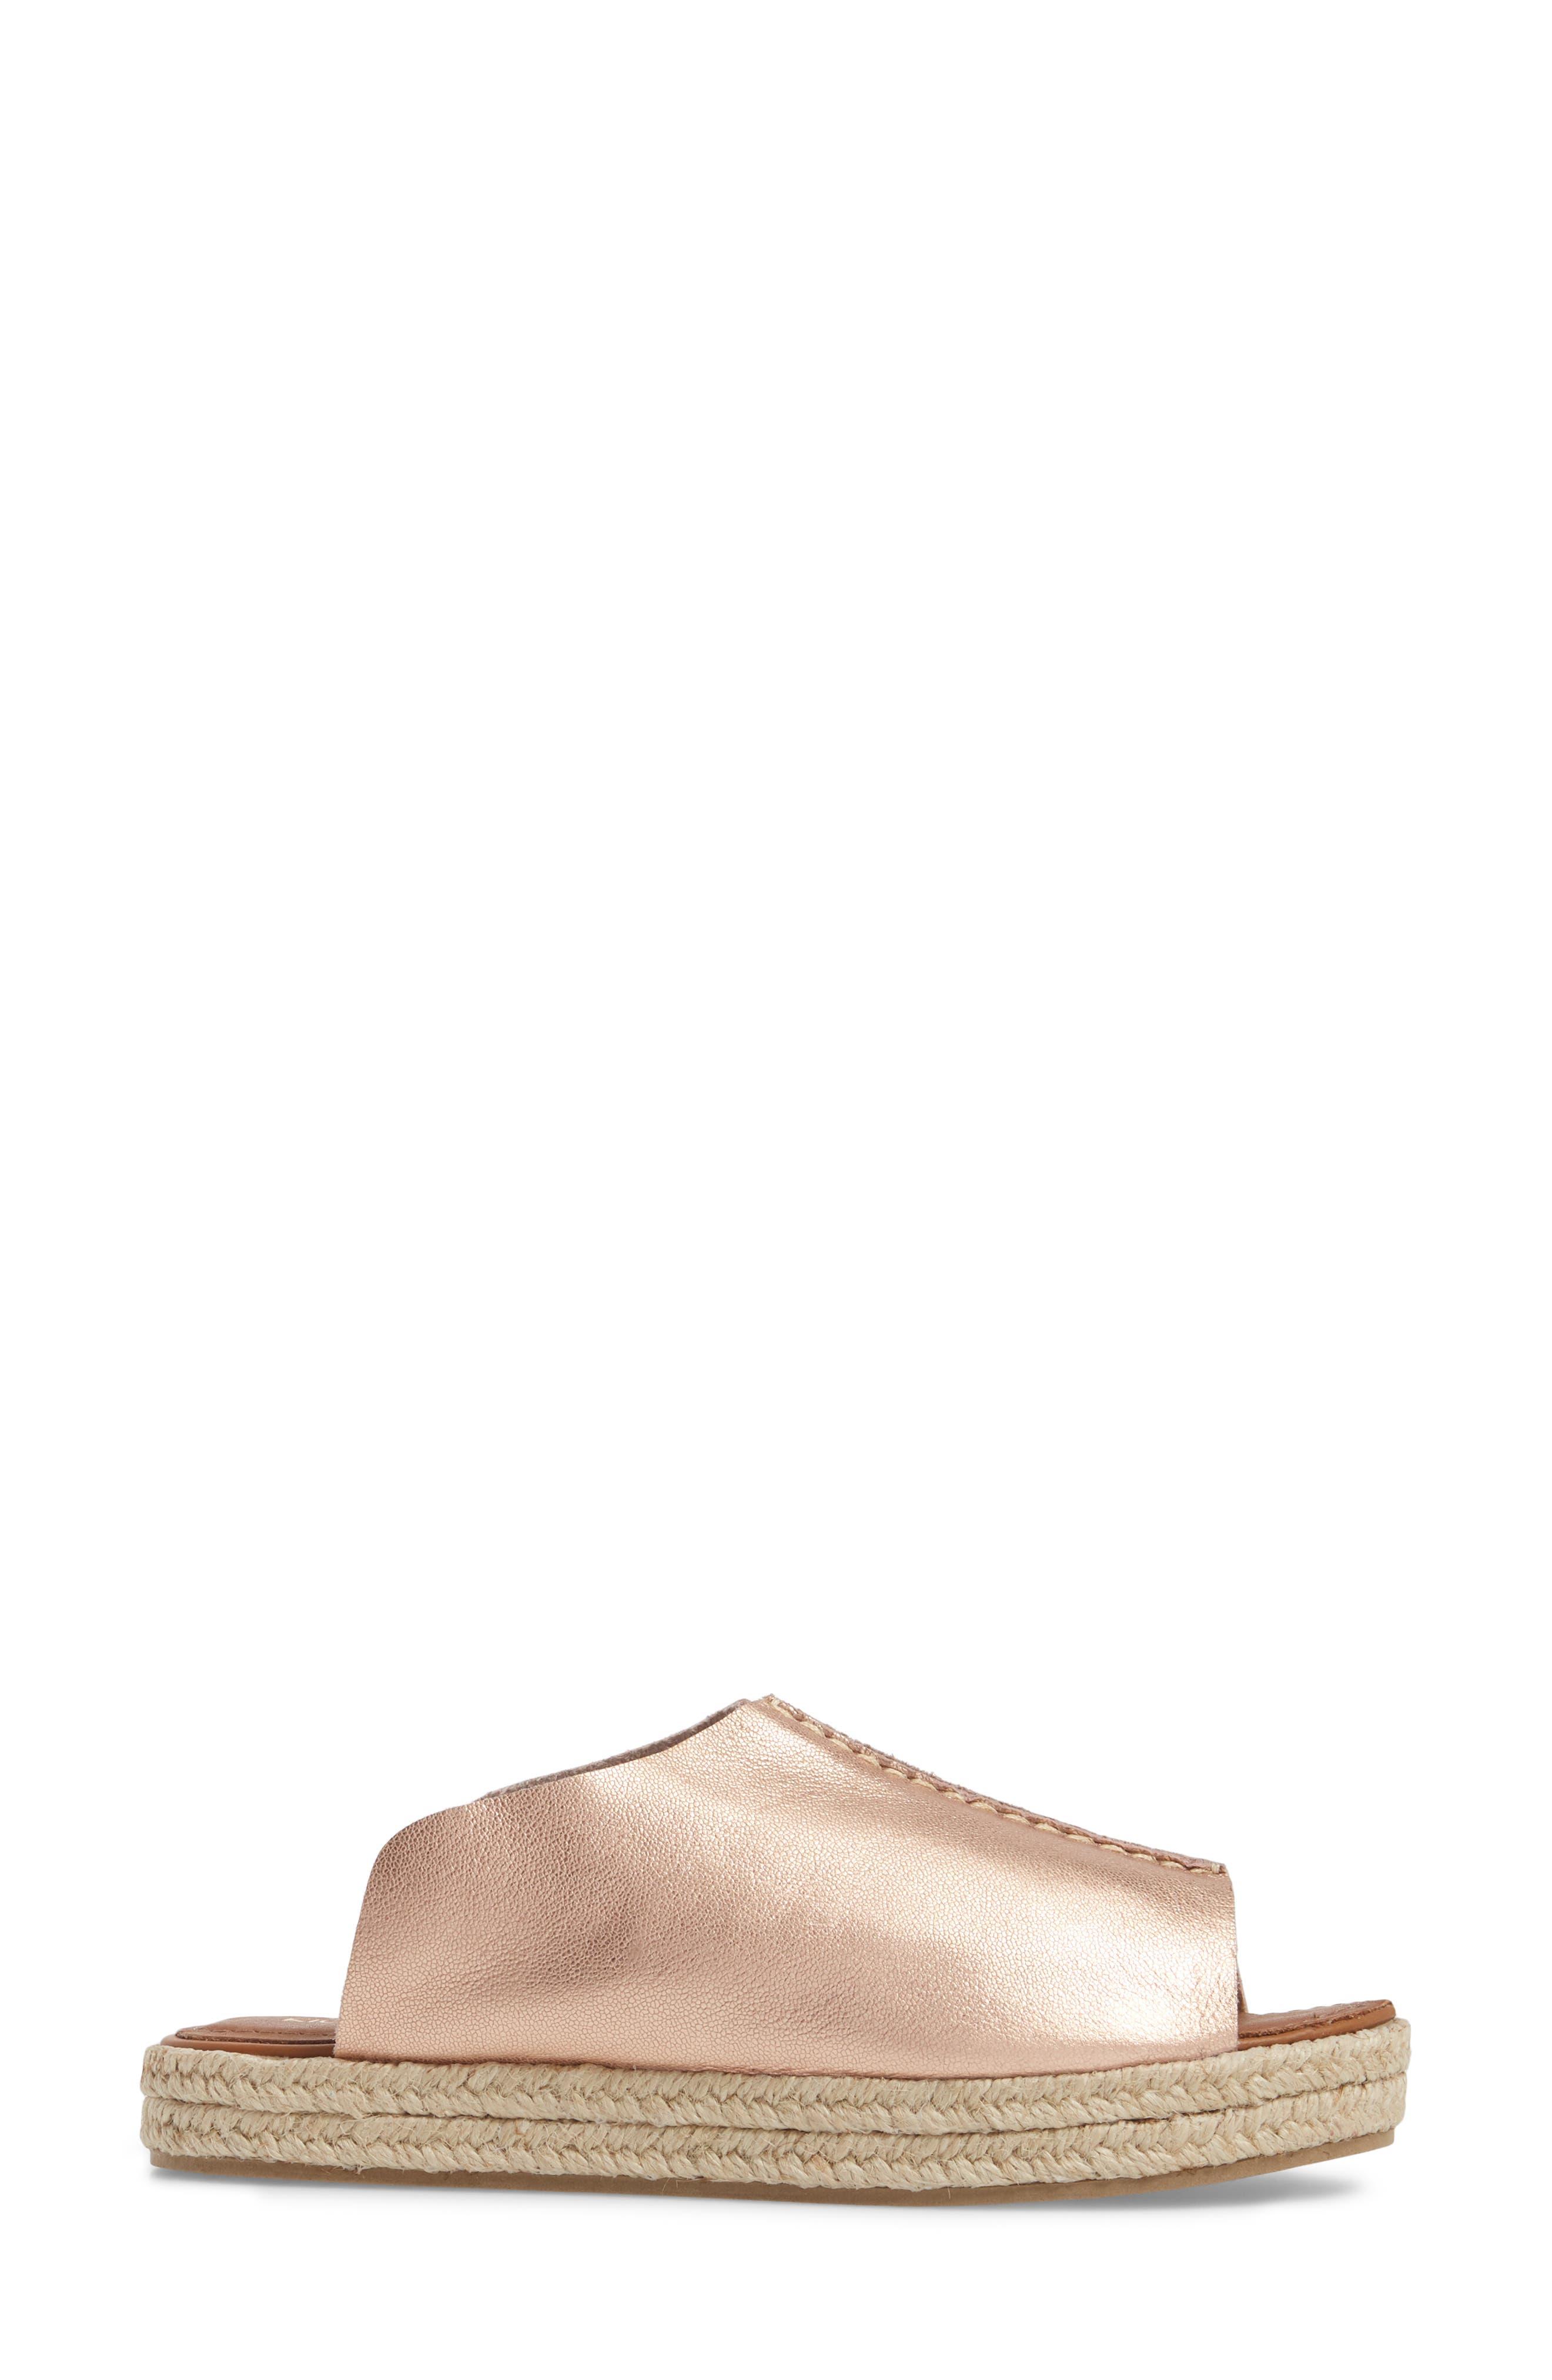 Gracey Espadrille Slide Sandal,                             Alternate thumbnail 3, color,                             ROSE LEATHER